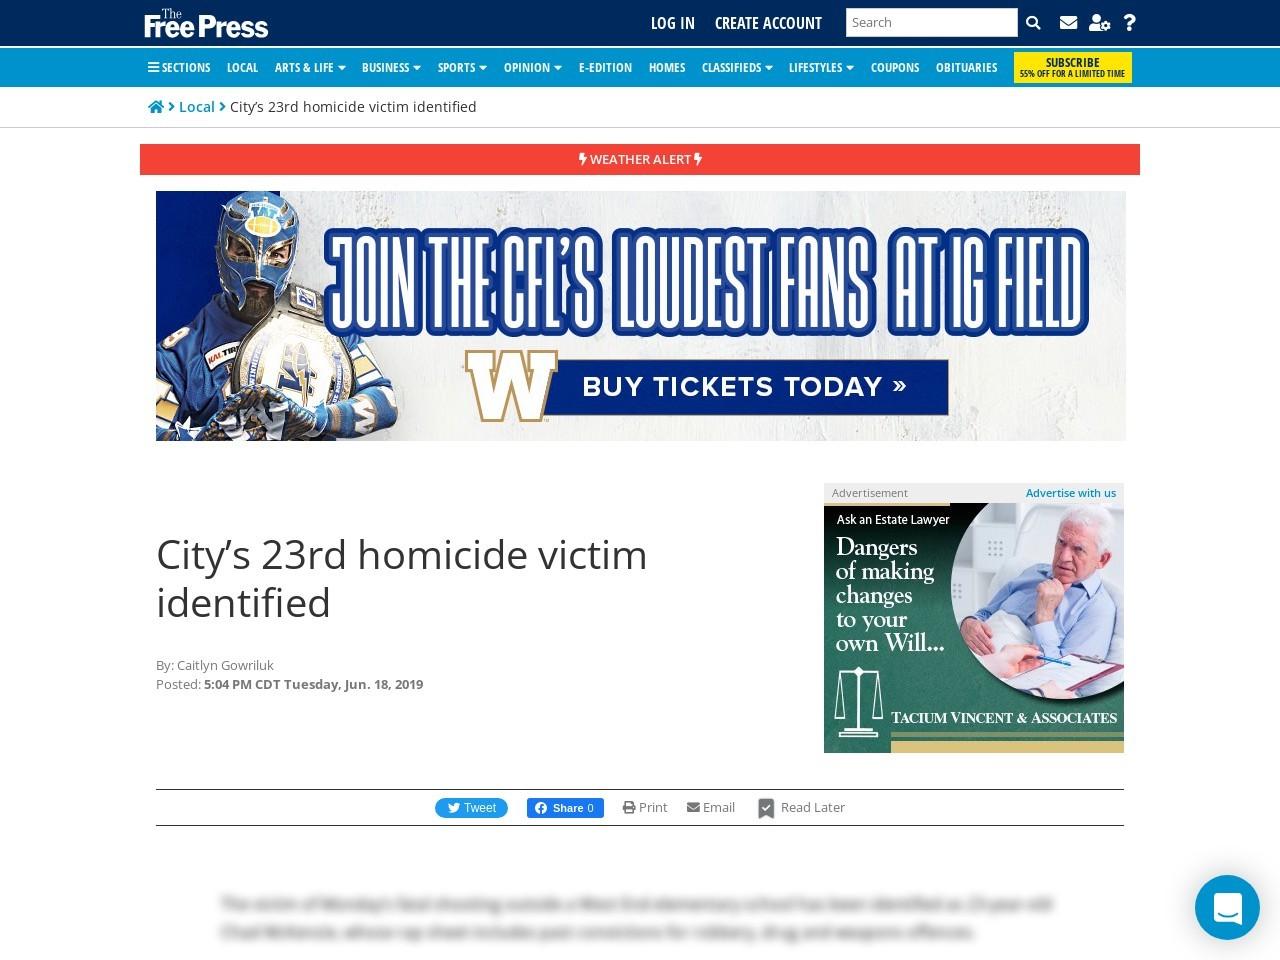 City's 23rd homicide victim identified